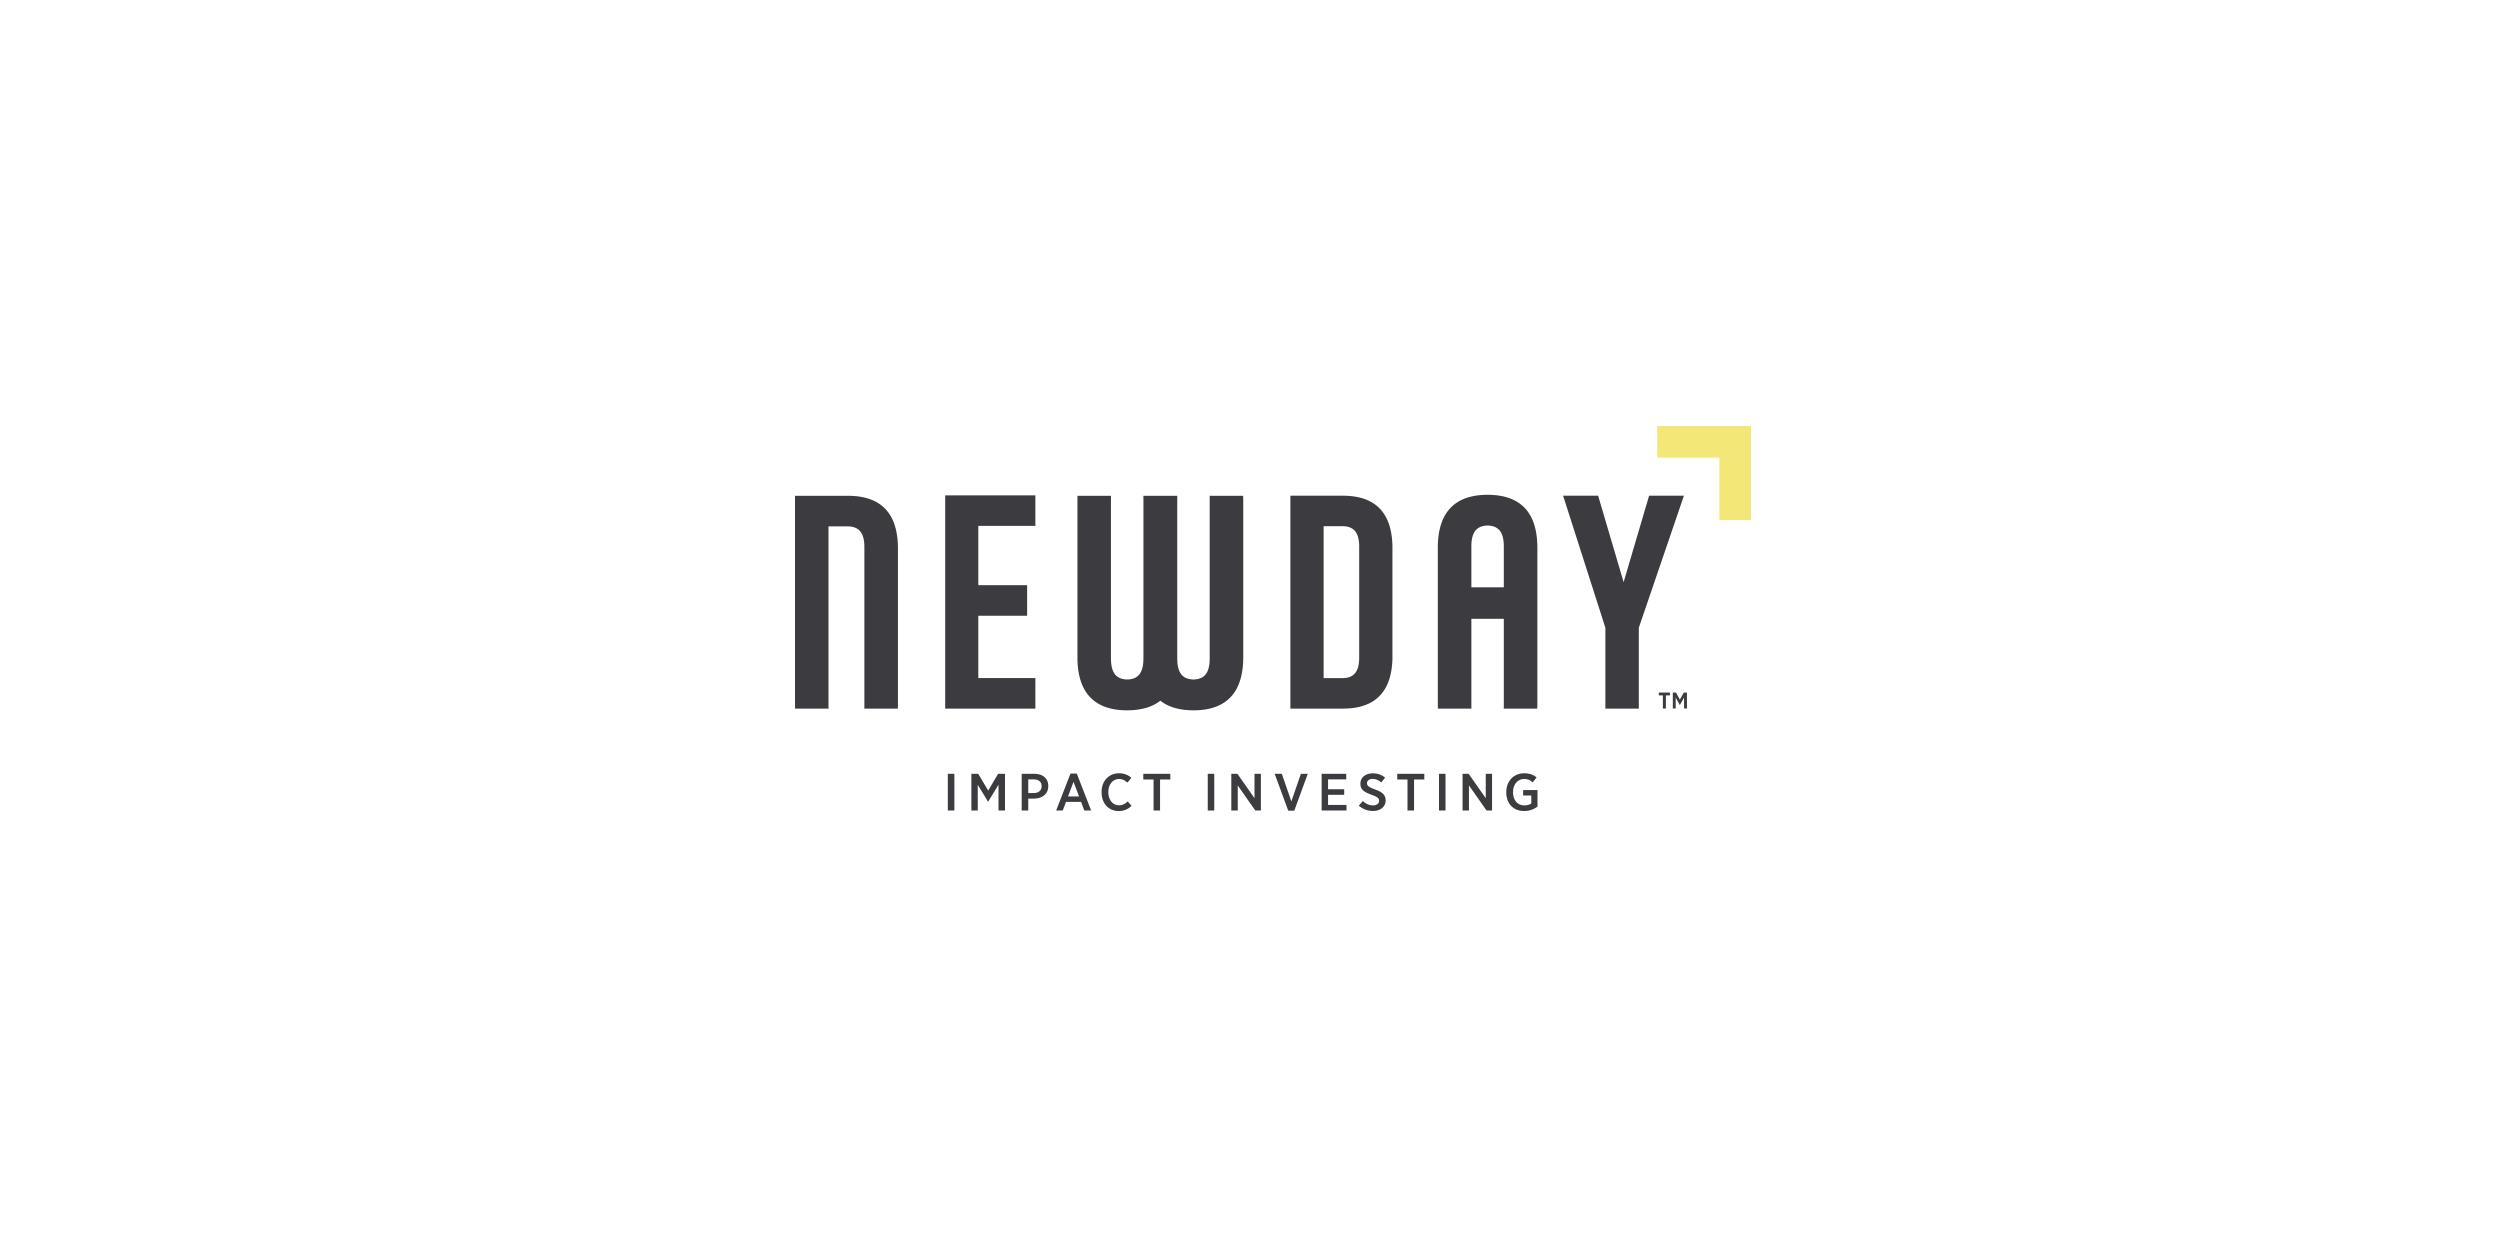 Newday: Impact Investing App